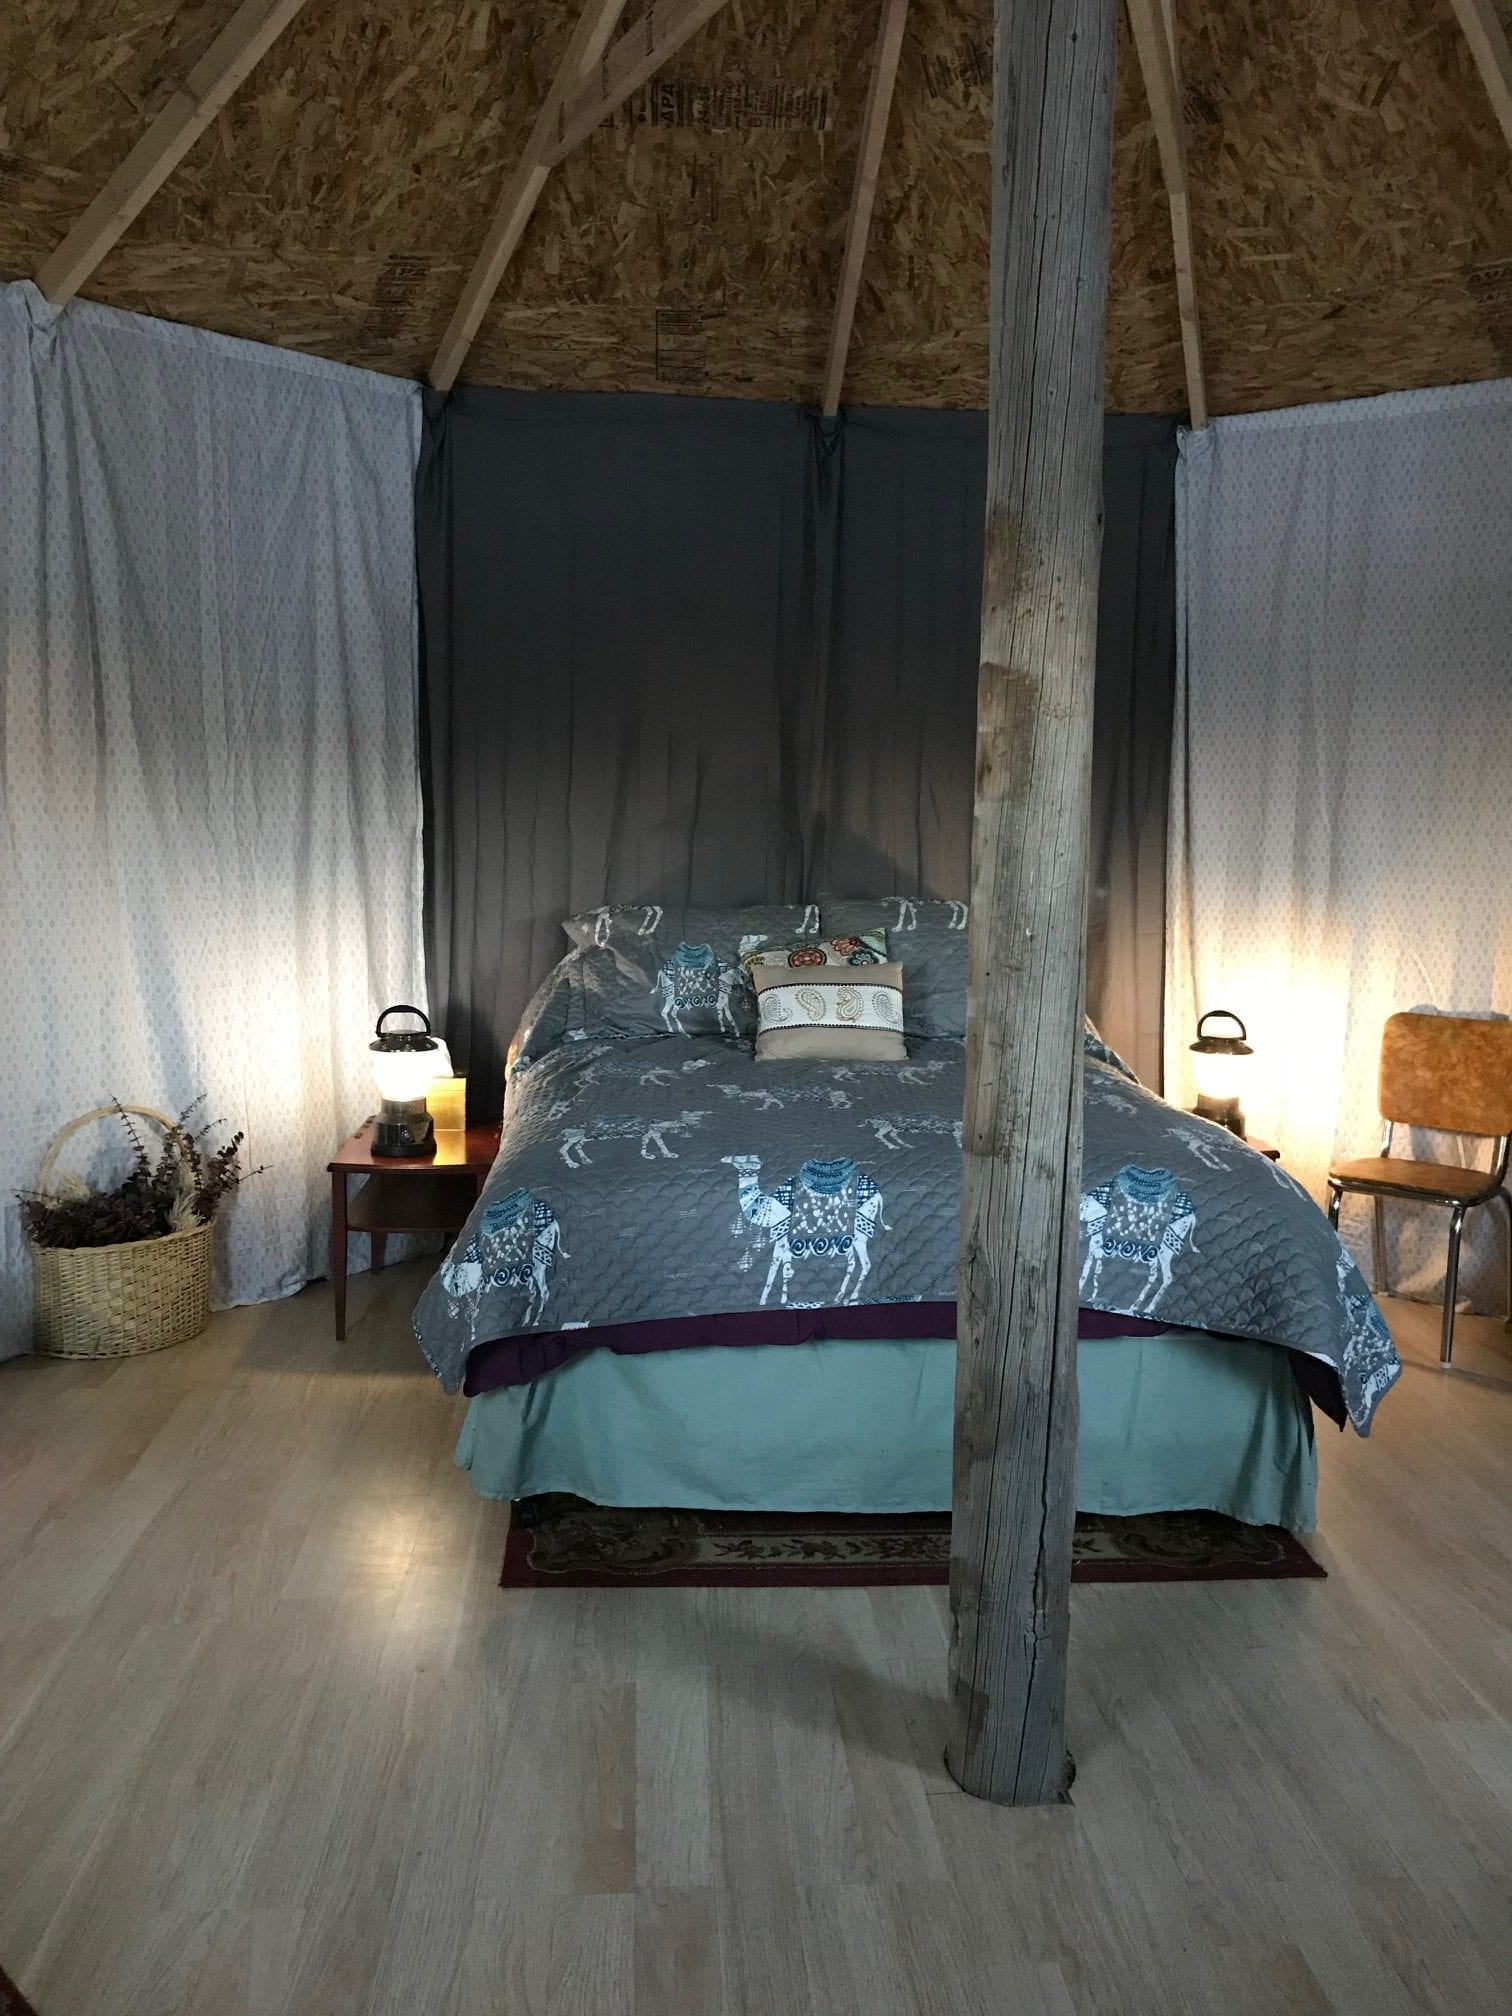 image of inside of yurt